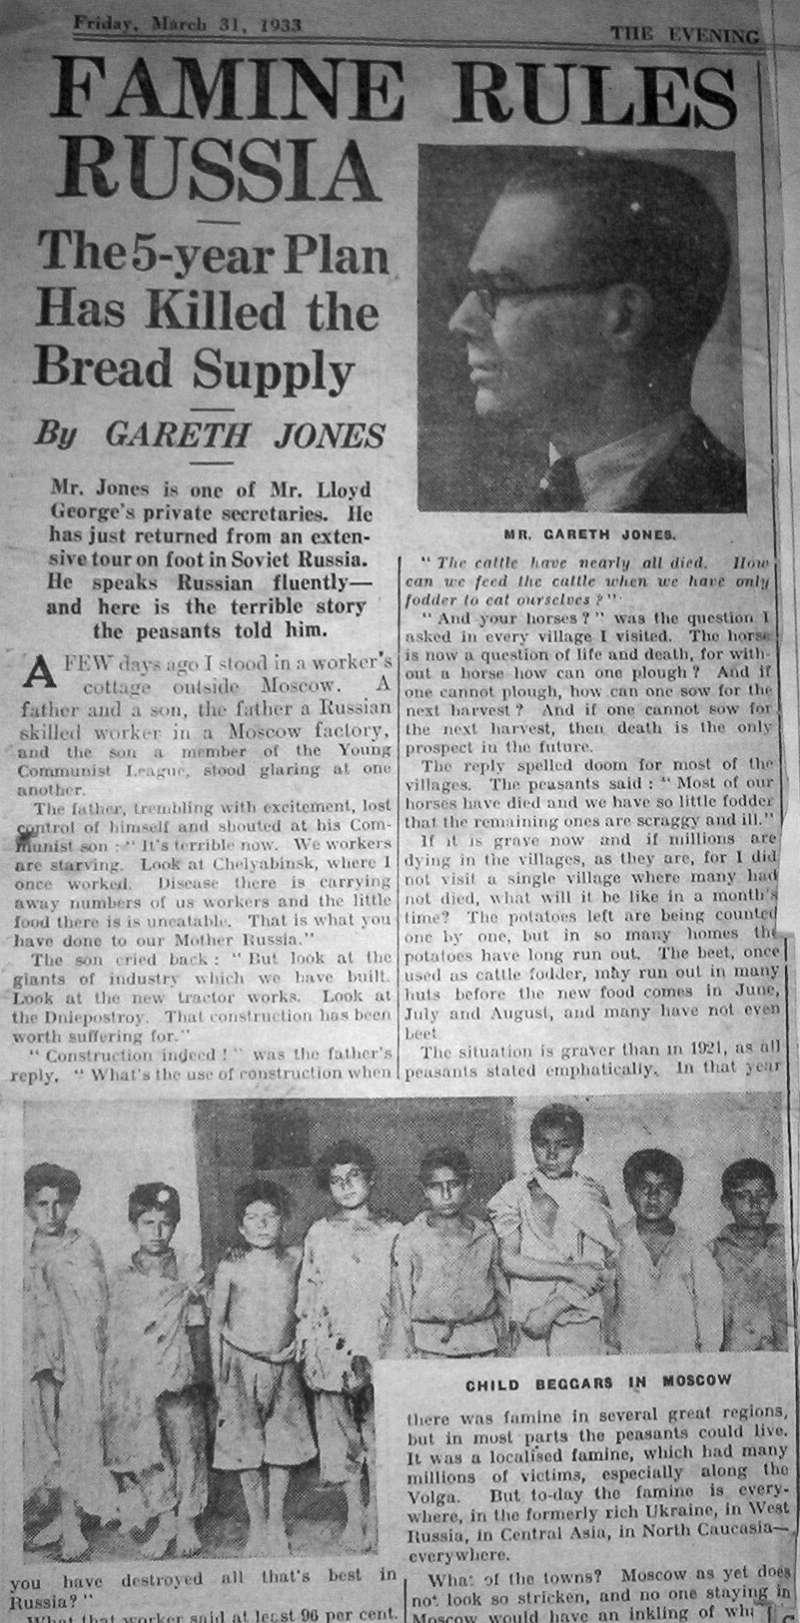 蓋瑞斯.瓊斯(Gareth Jones)1933年對烏克蘭大饑荒的報導(https://www.garethjones.org/)